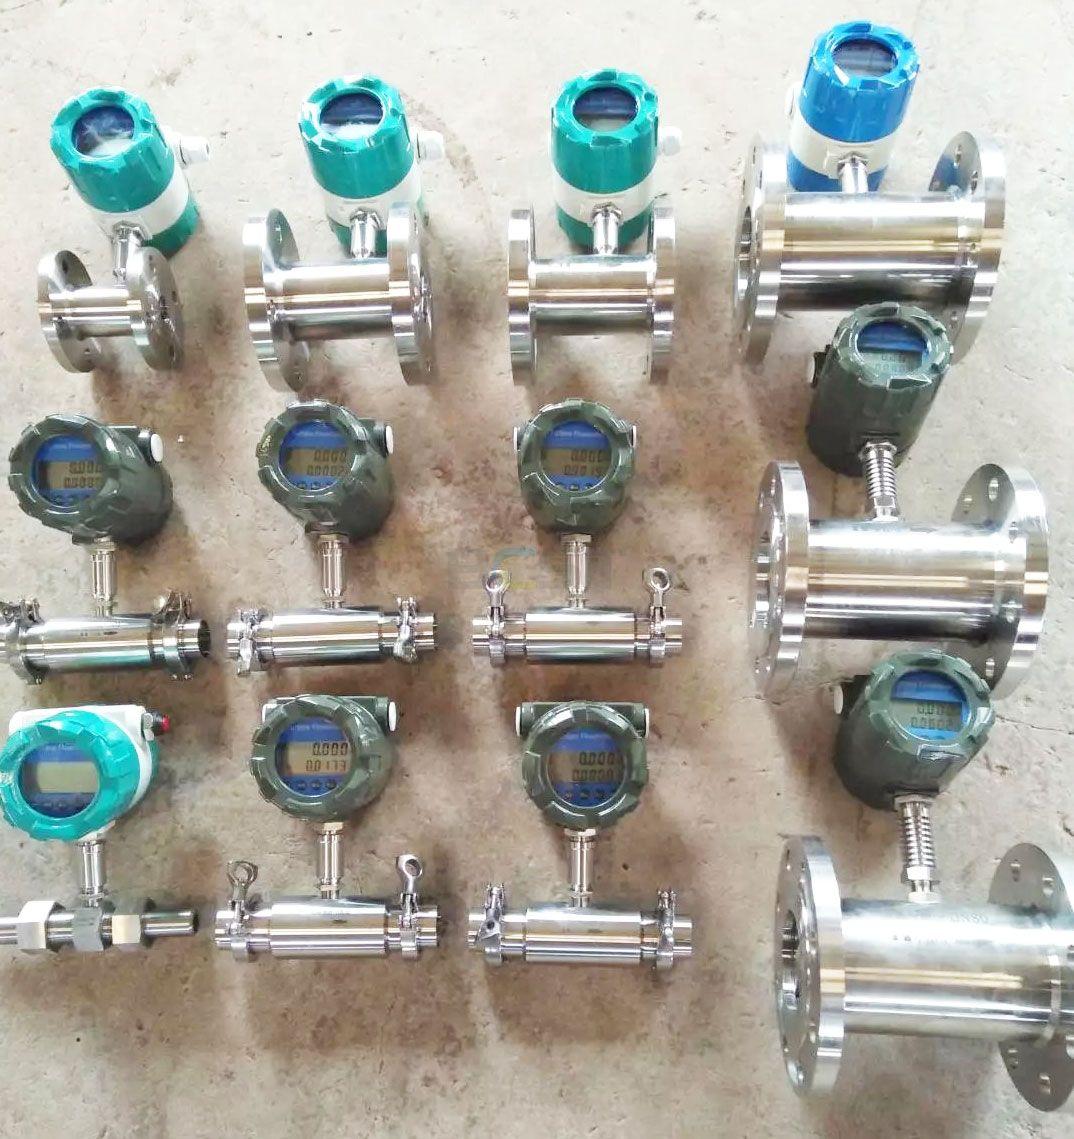 JC060 Liquid Turbine Flow Meter with pulse output 4